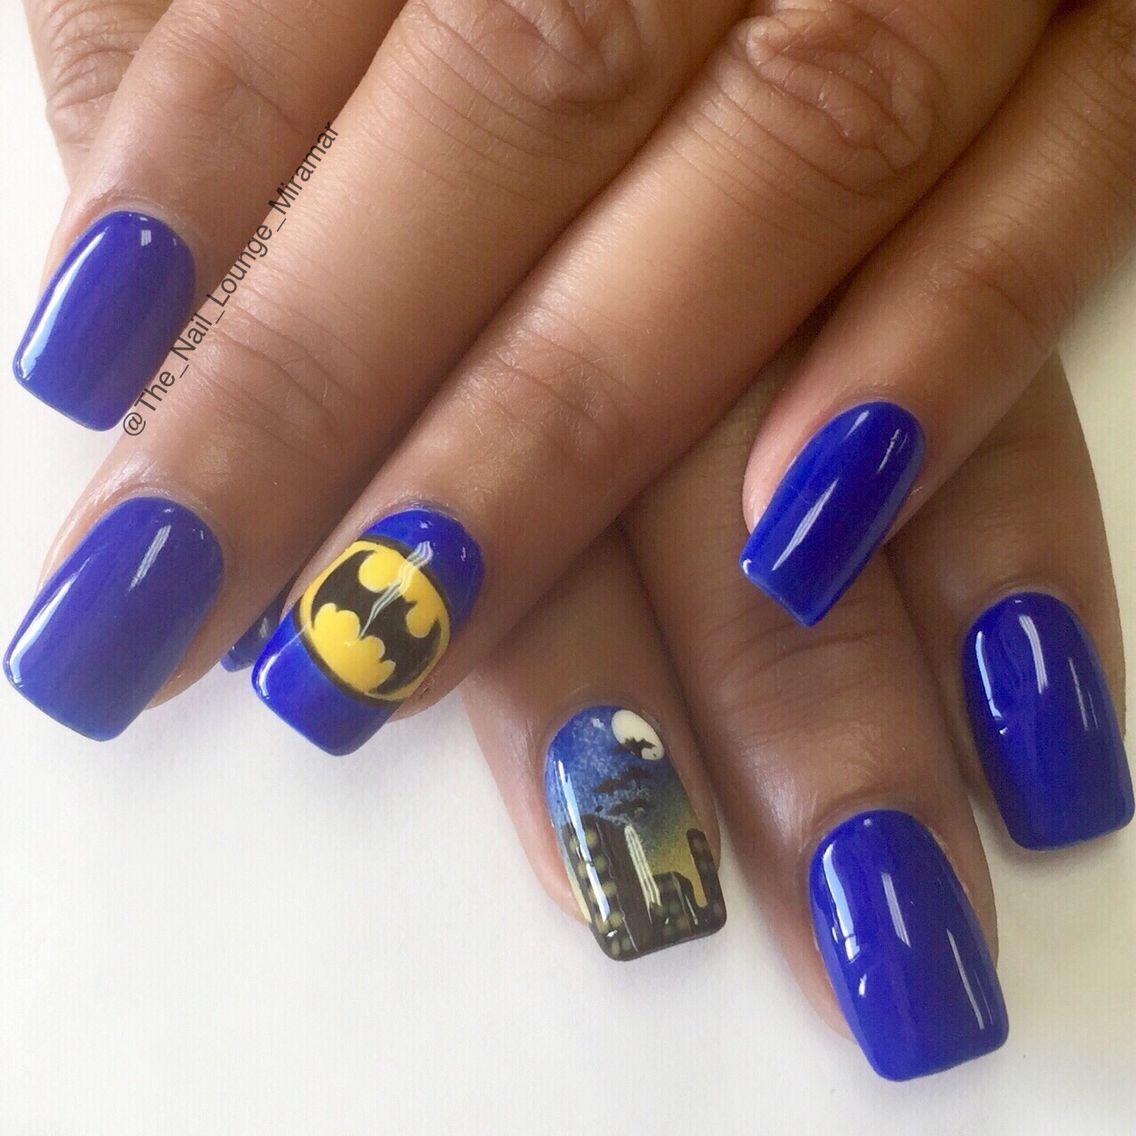 About baby boomer nail art tutorial by nded on pinterest nail art - Batman Nail Art Design